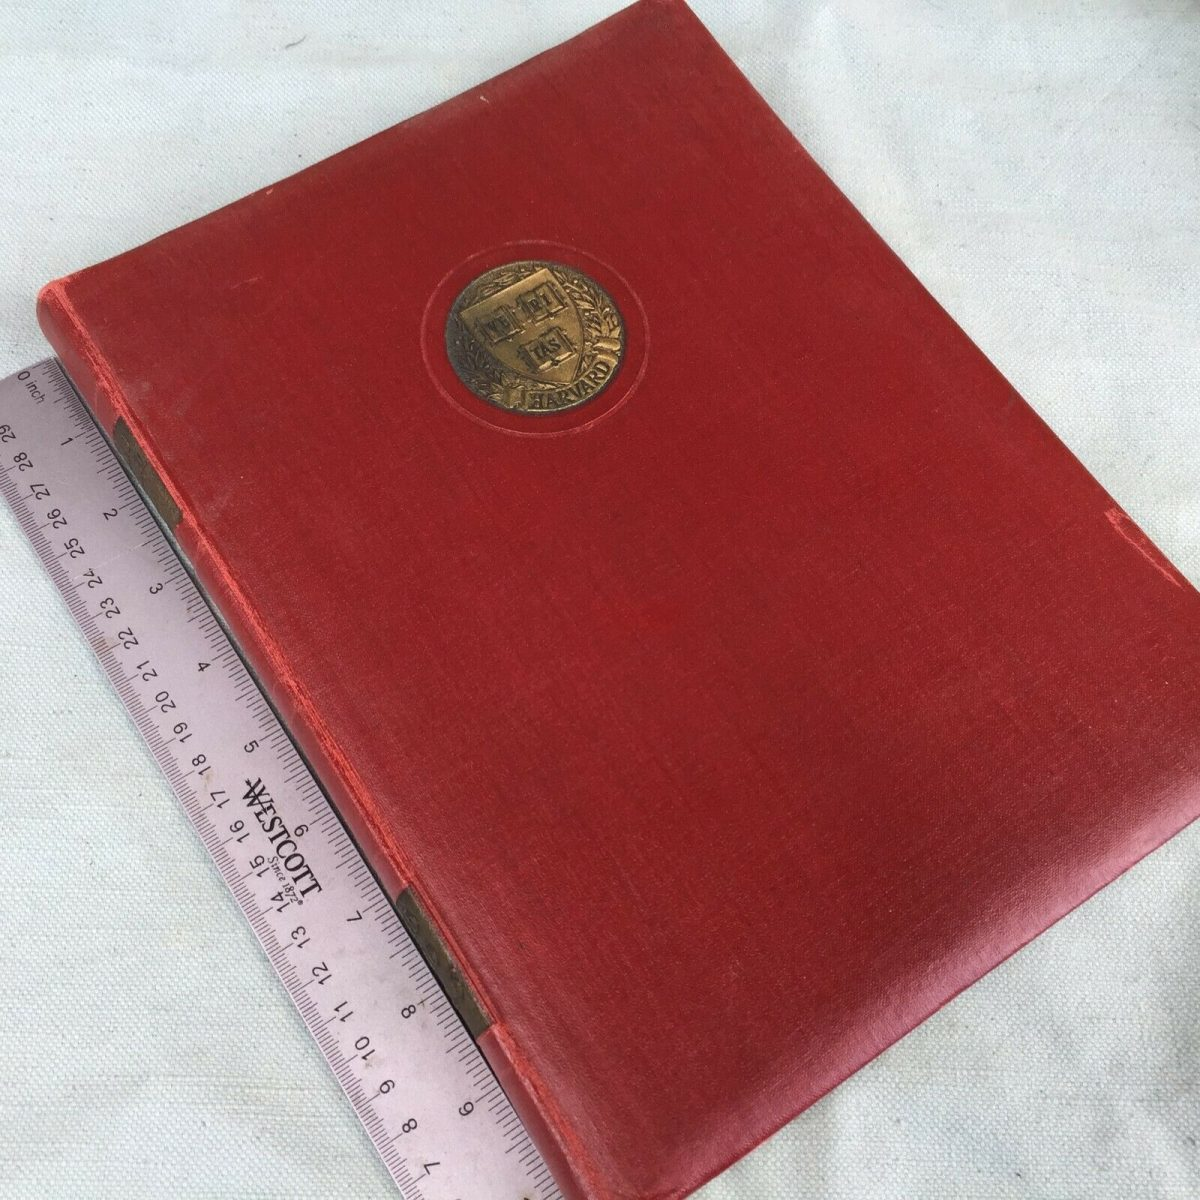 Harvard University Law School Yearbook 1945 1946 College Class Album Annual VTG